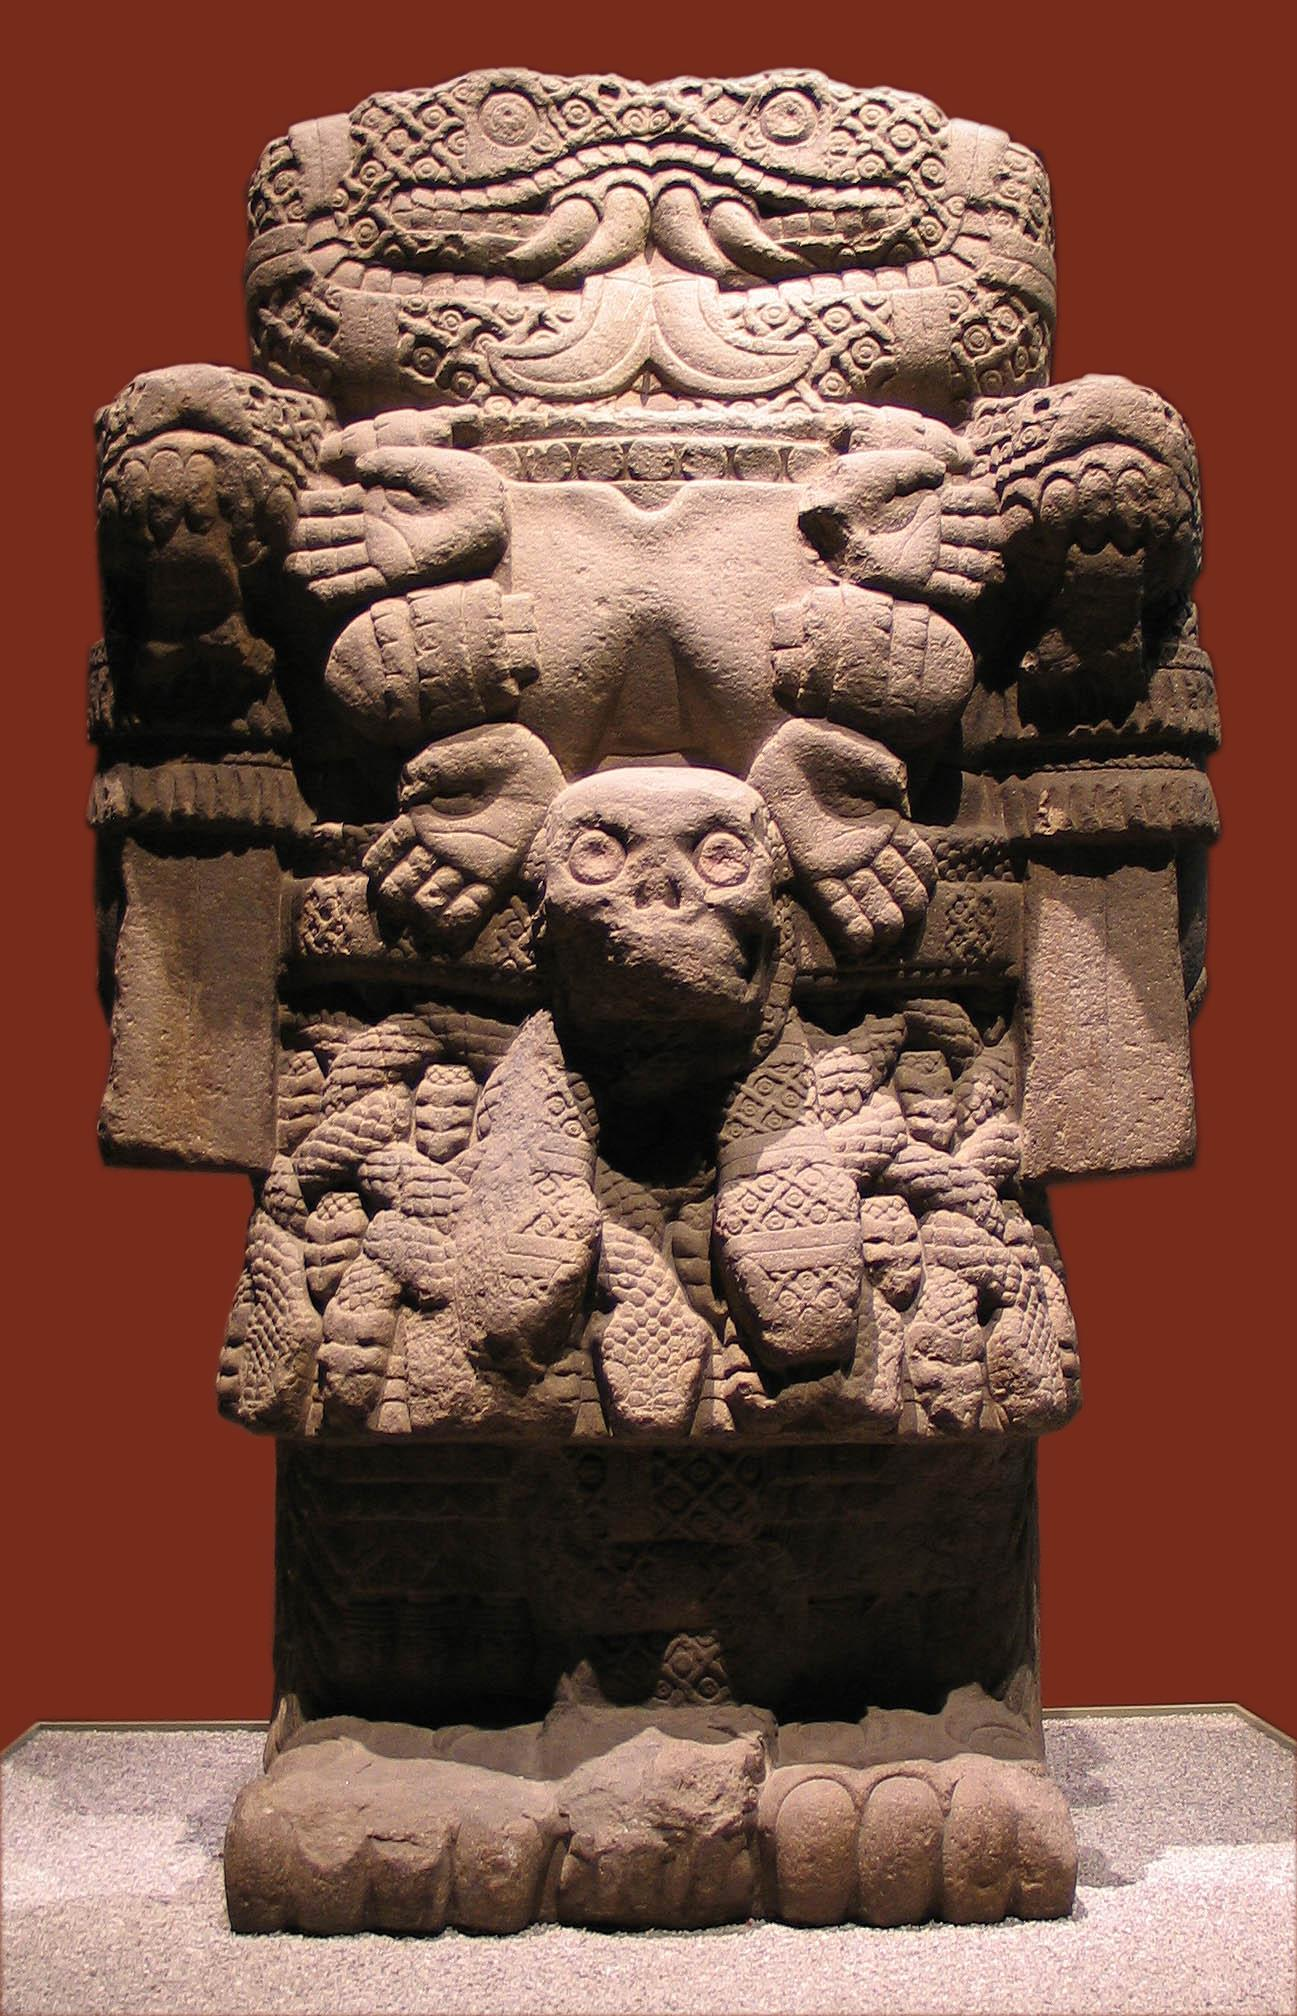 Coatlicue Mayan Statue